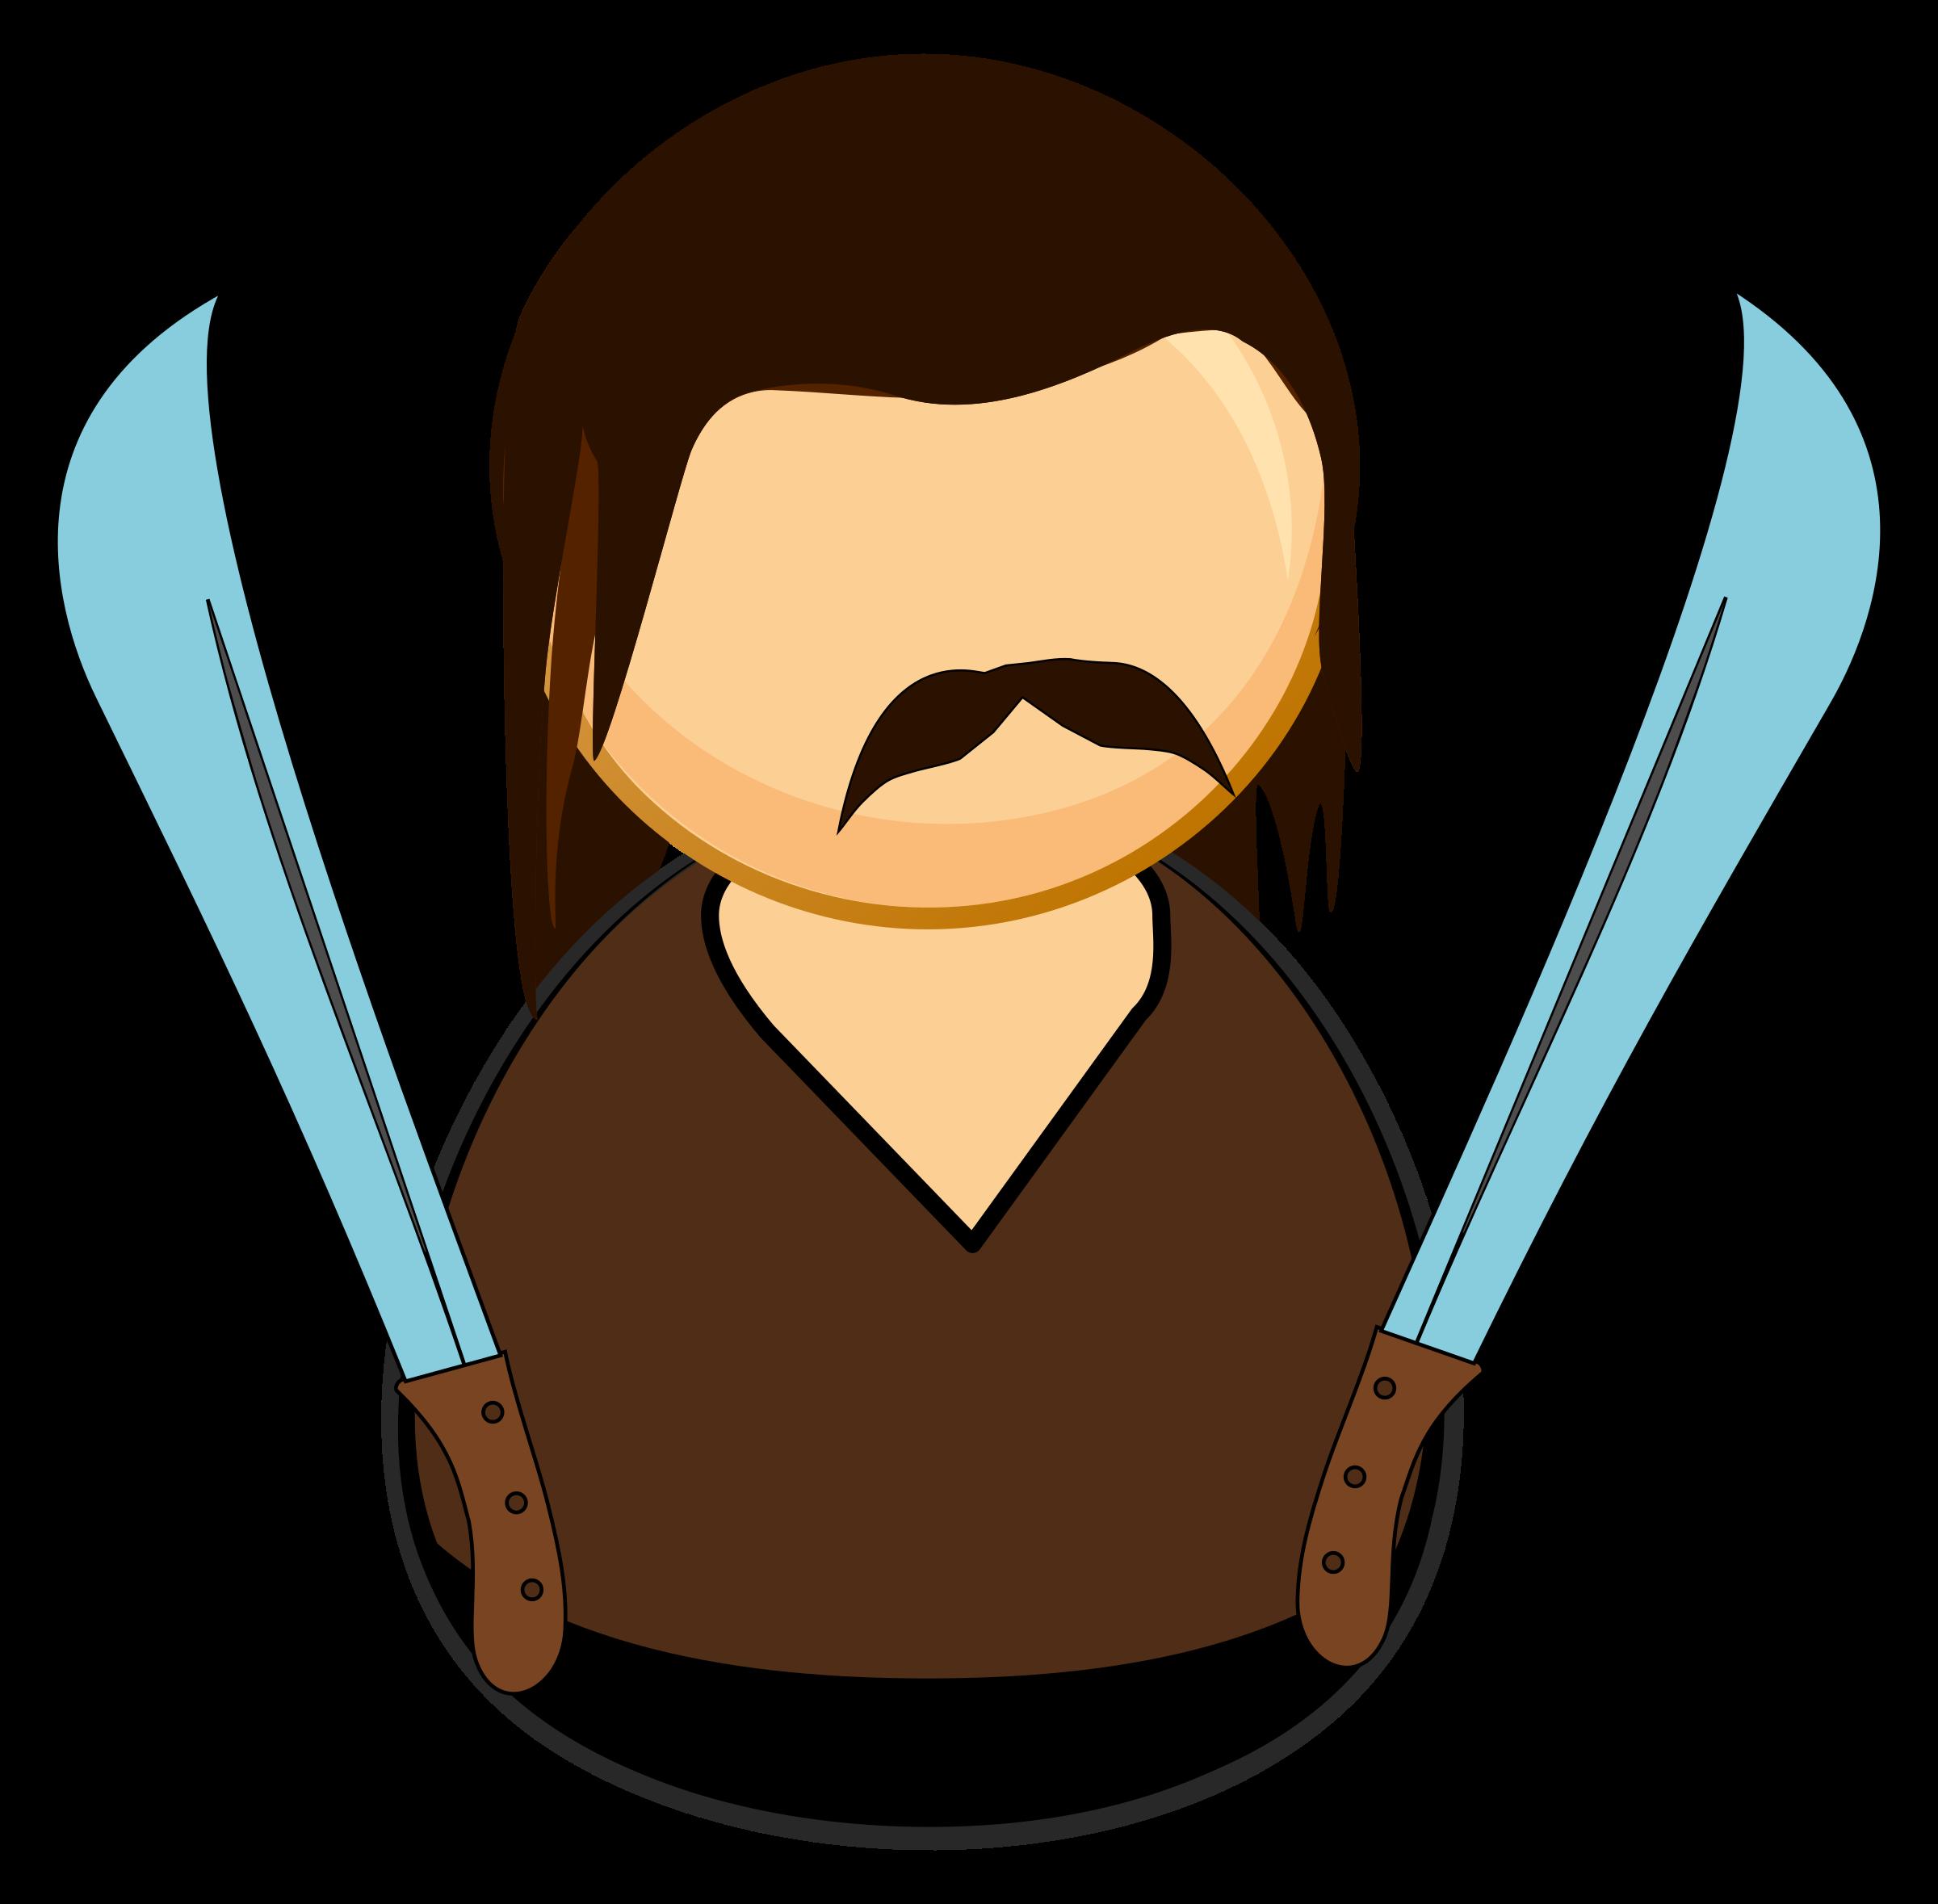 Clipart sword machete. Killer icons png free